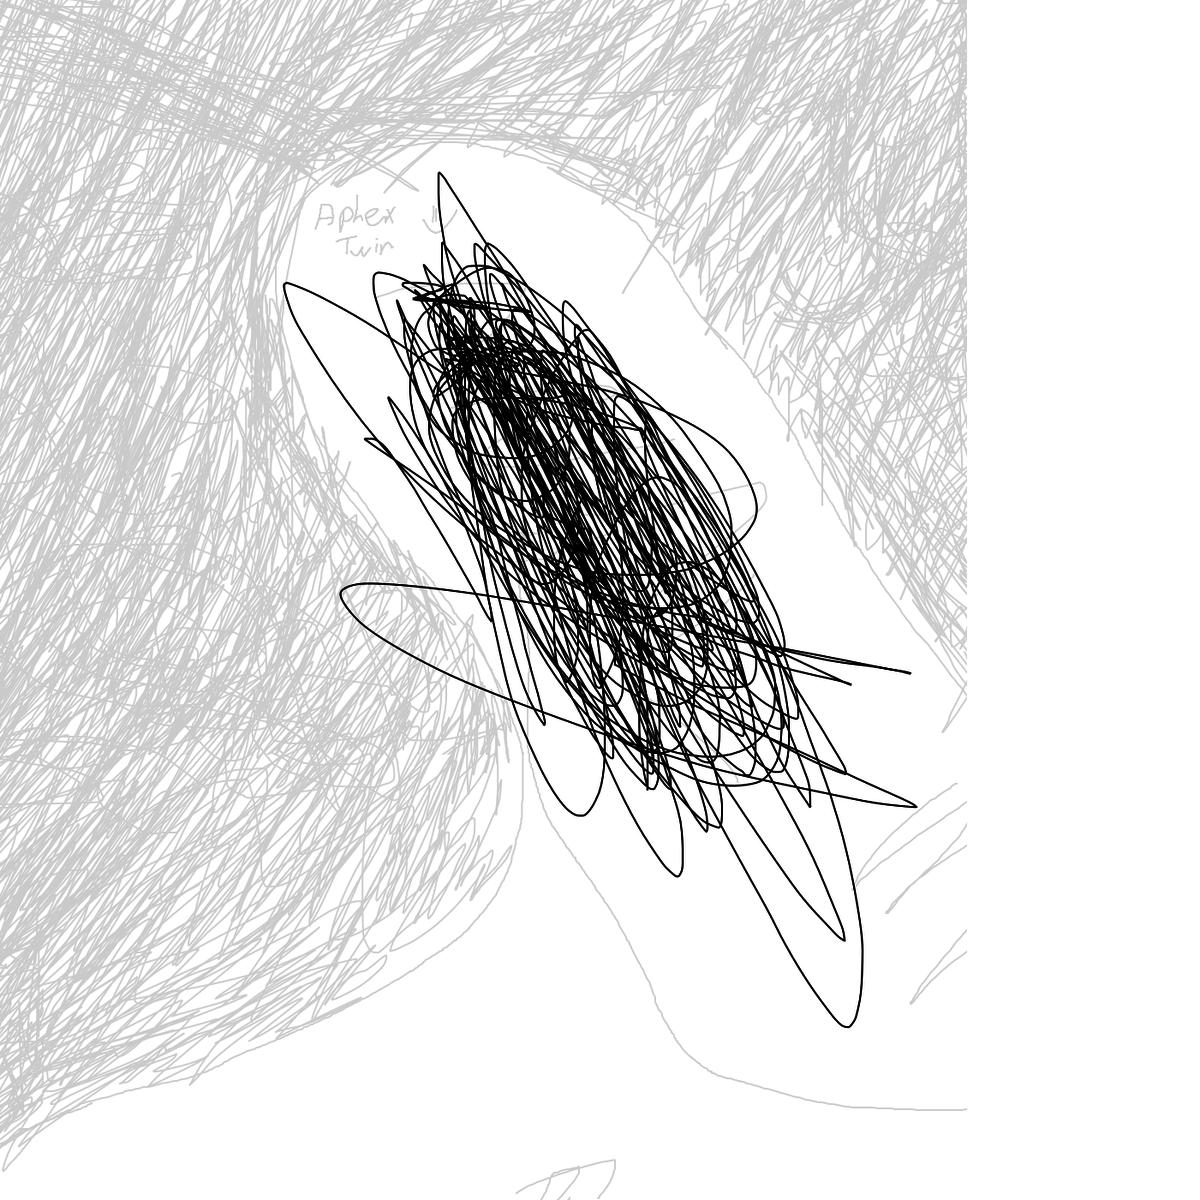 BAAAM drawing#24618 lat:52.4753379821777340lng: 13.4065637588500980